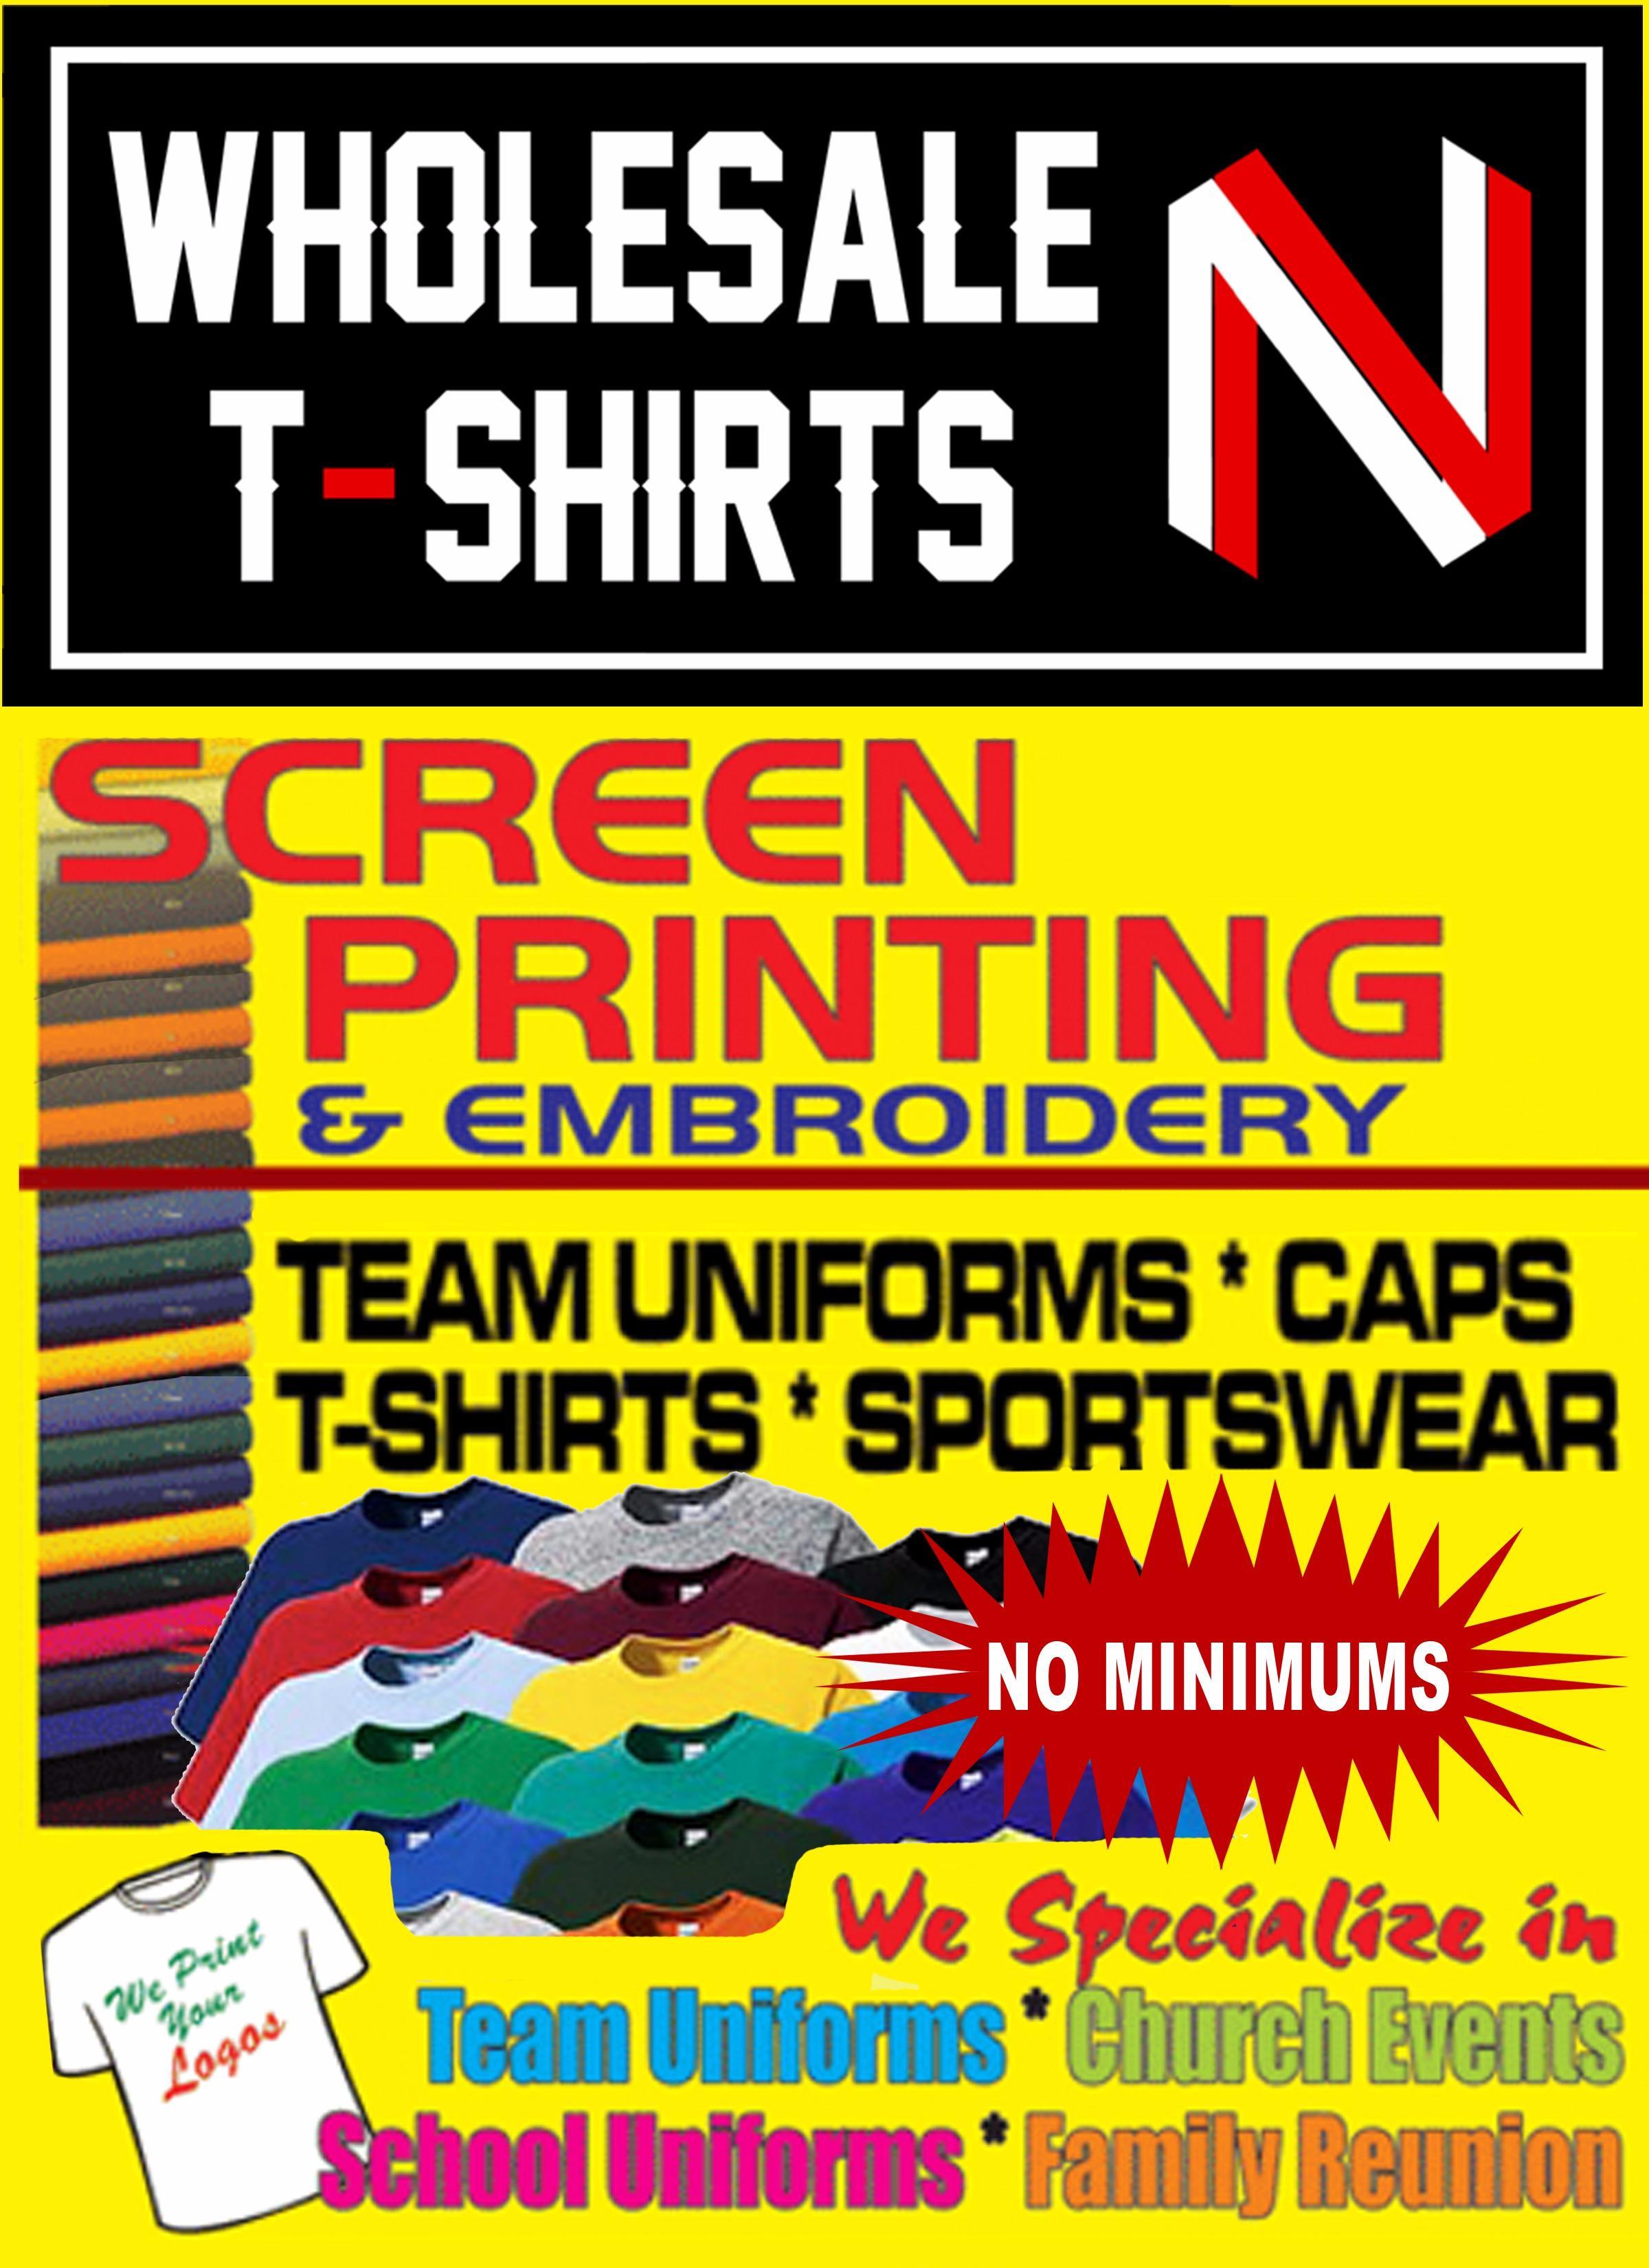 wholesale t shirts N image 5